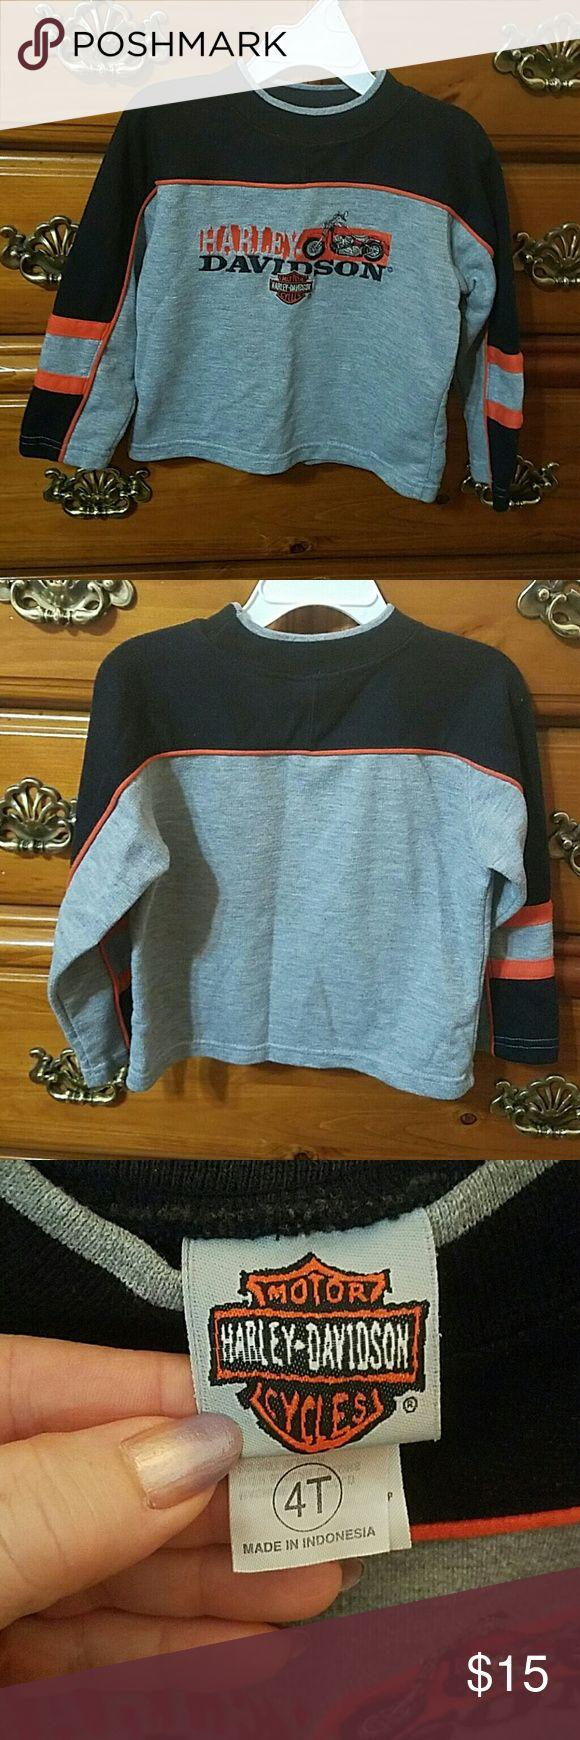 Harley Davidson sweatshirt Embroidered Harley Davidson sweatshirt. Harley-Davidson Shirts & Tops Sweatshirts & Hoodies